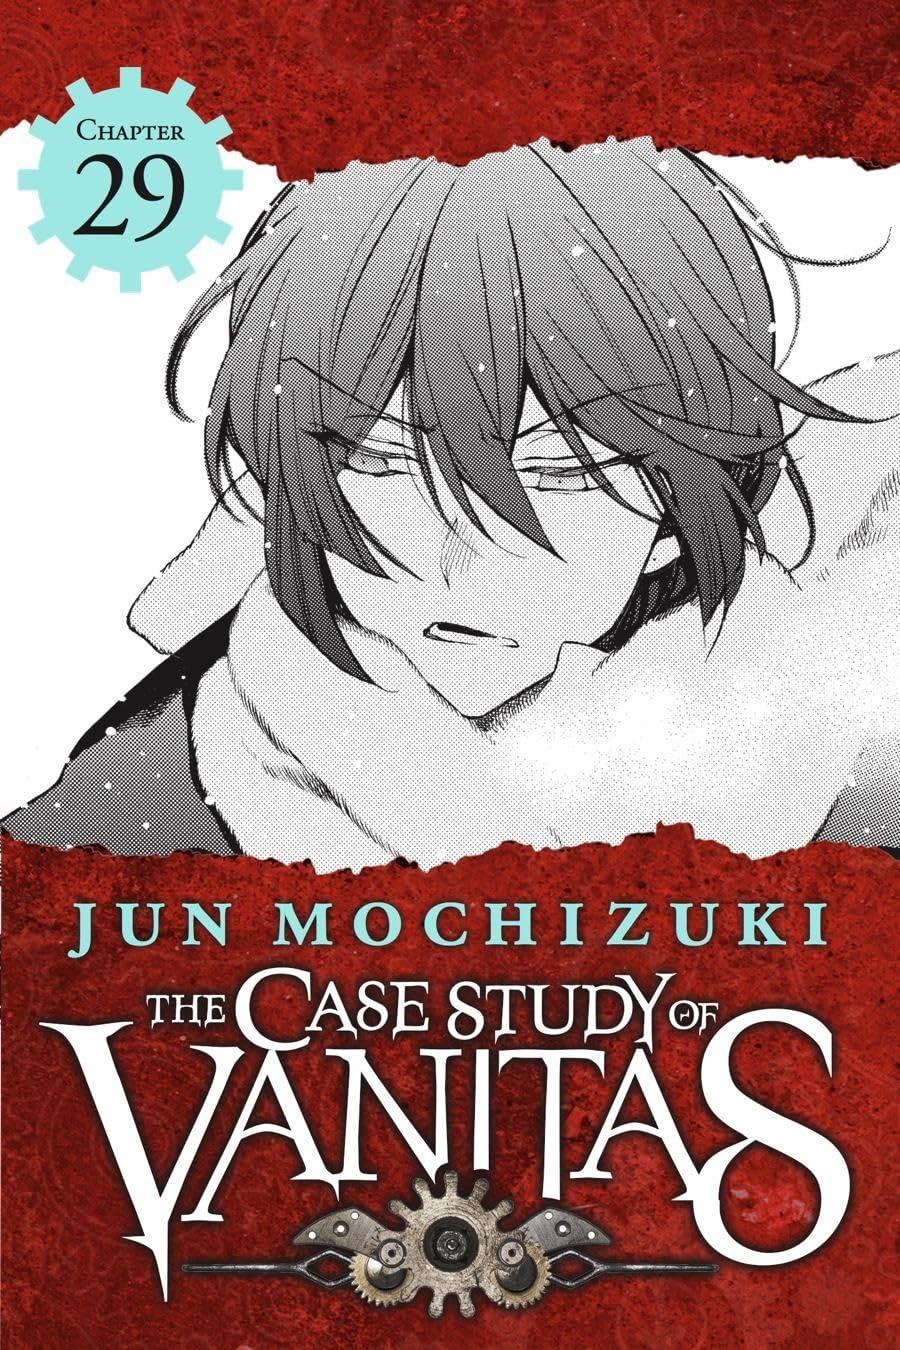 The Case Study of Vanitas #29